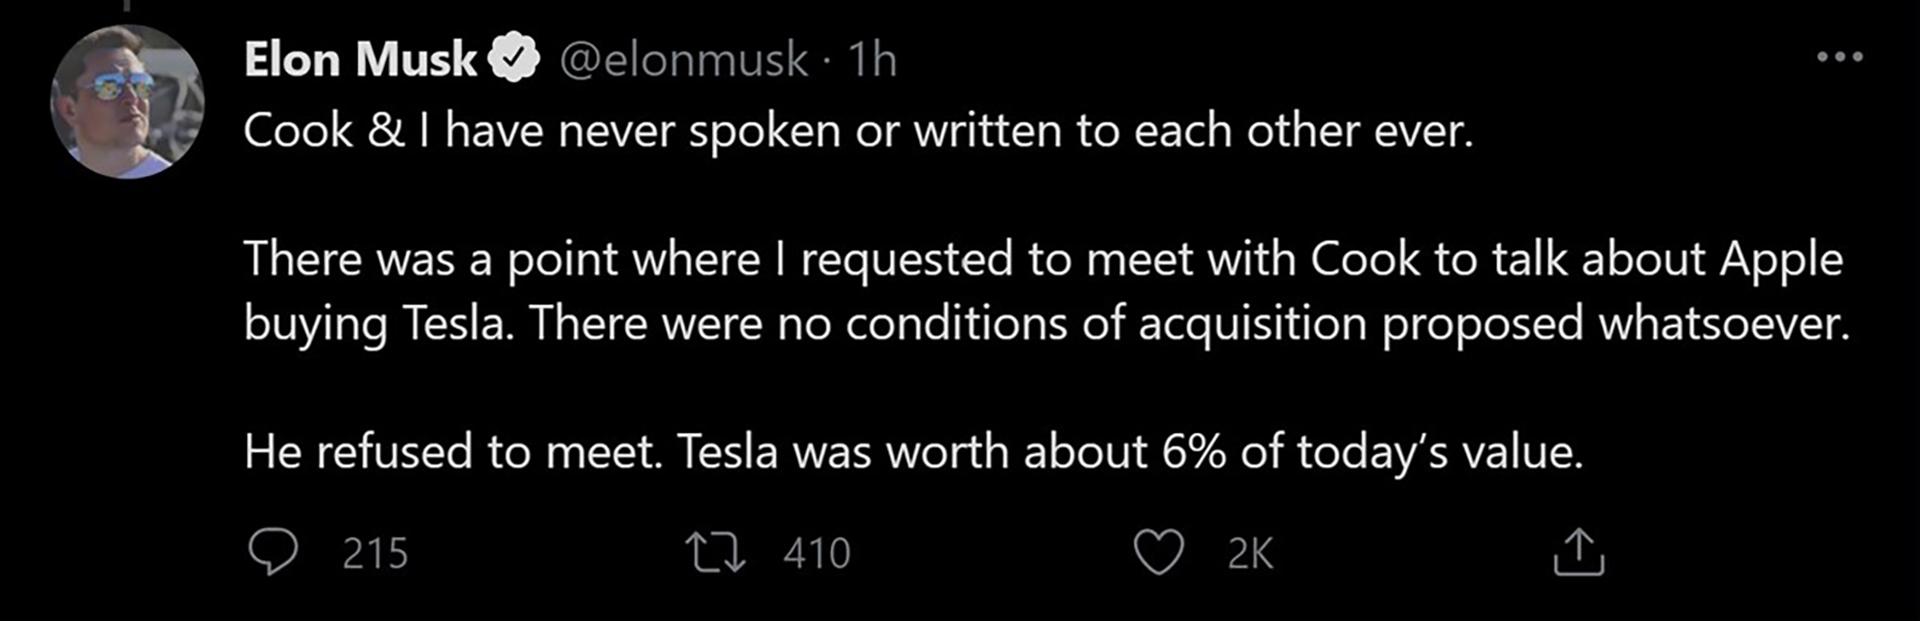 Elon musk with apple